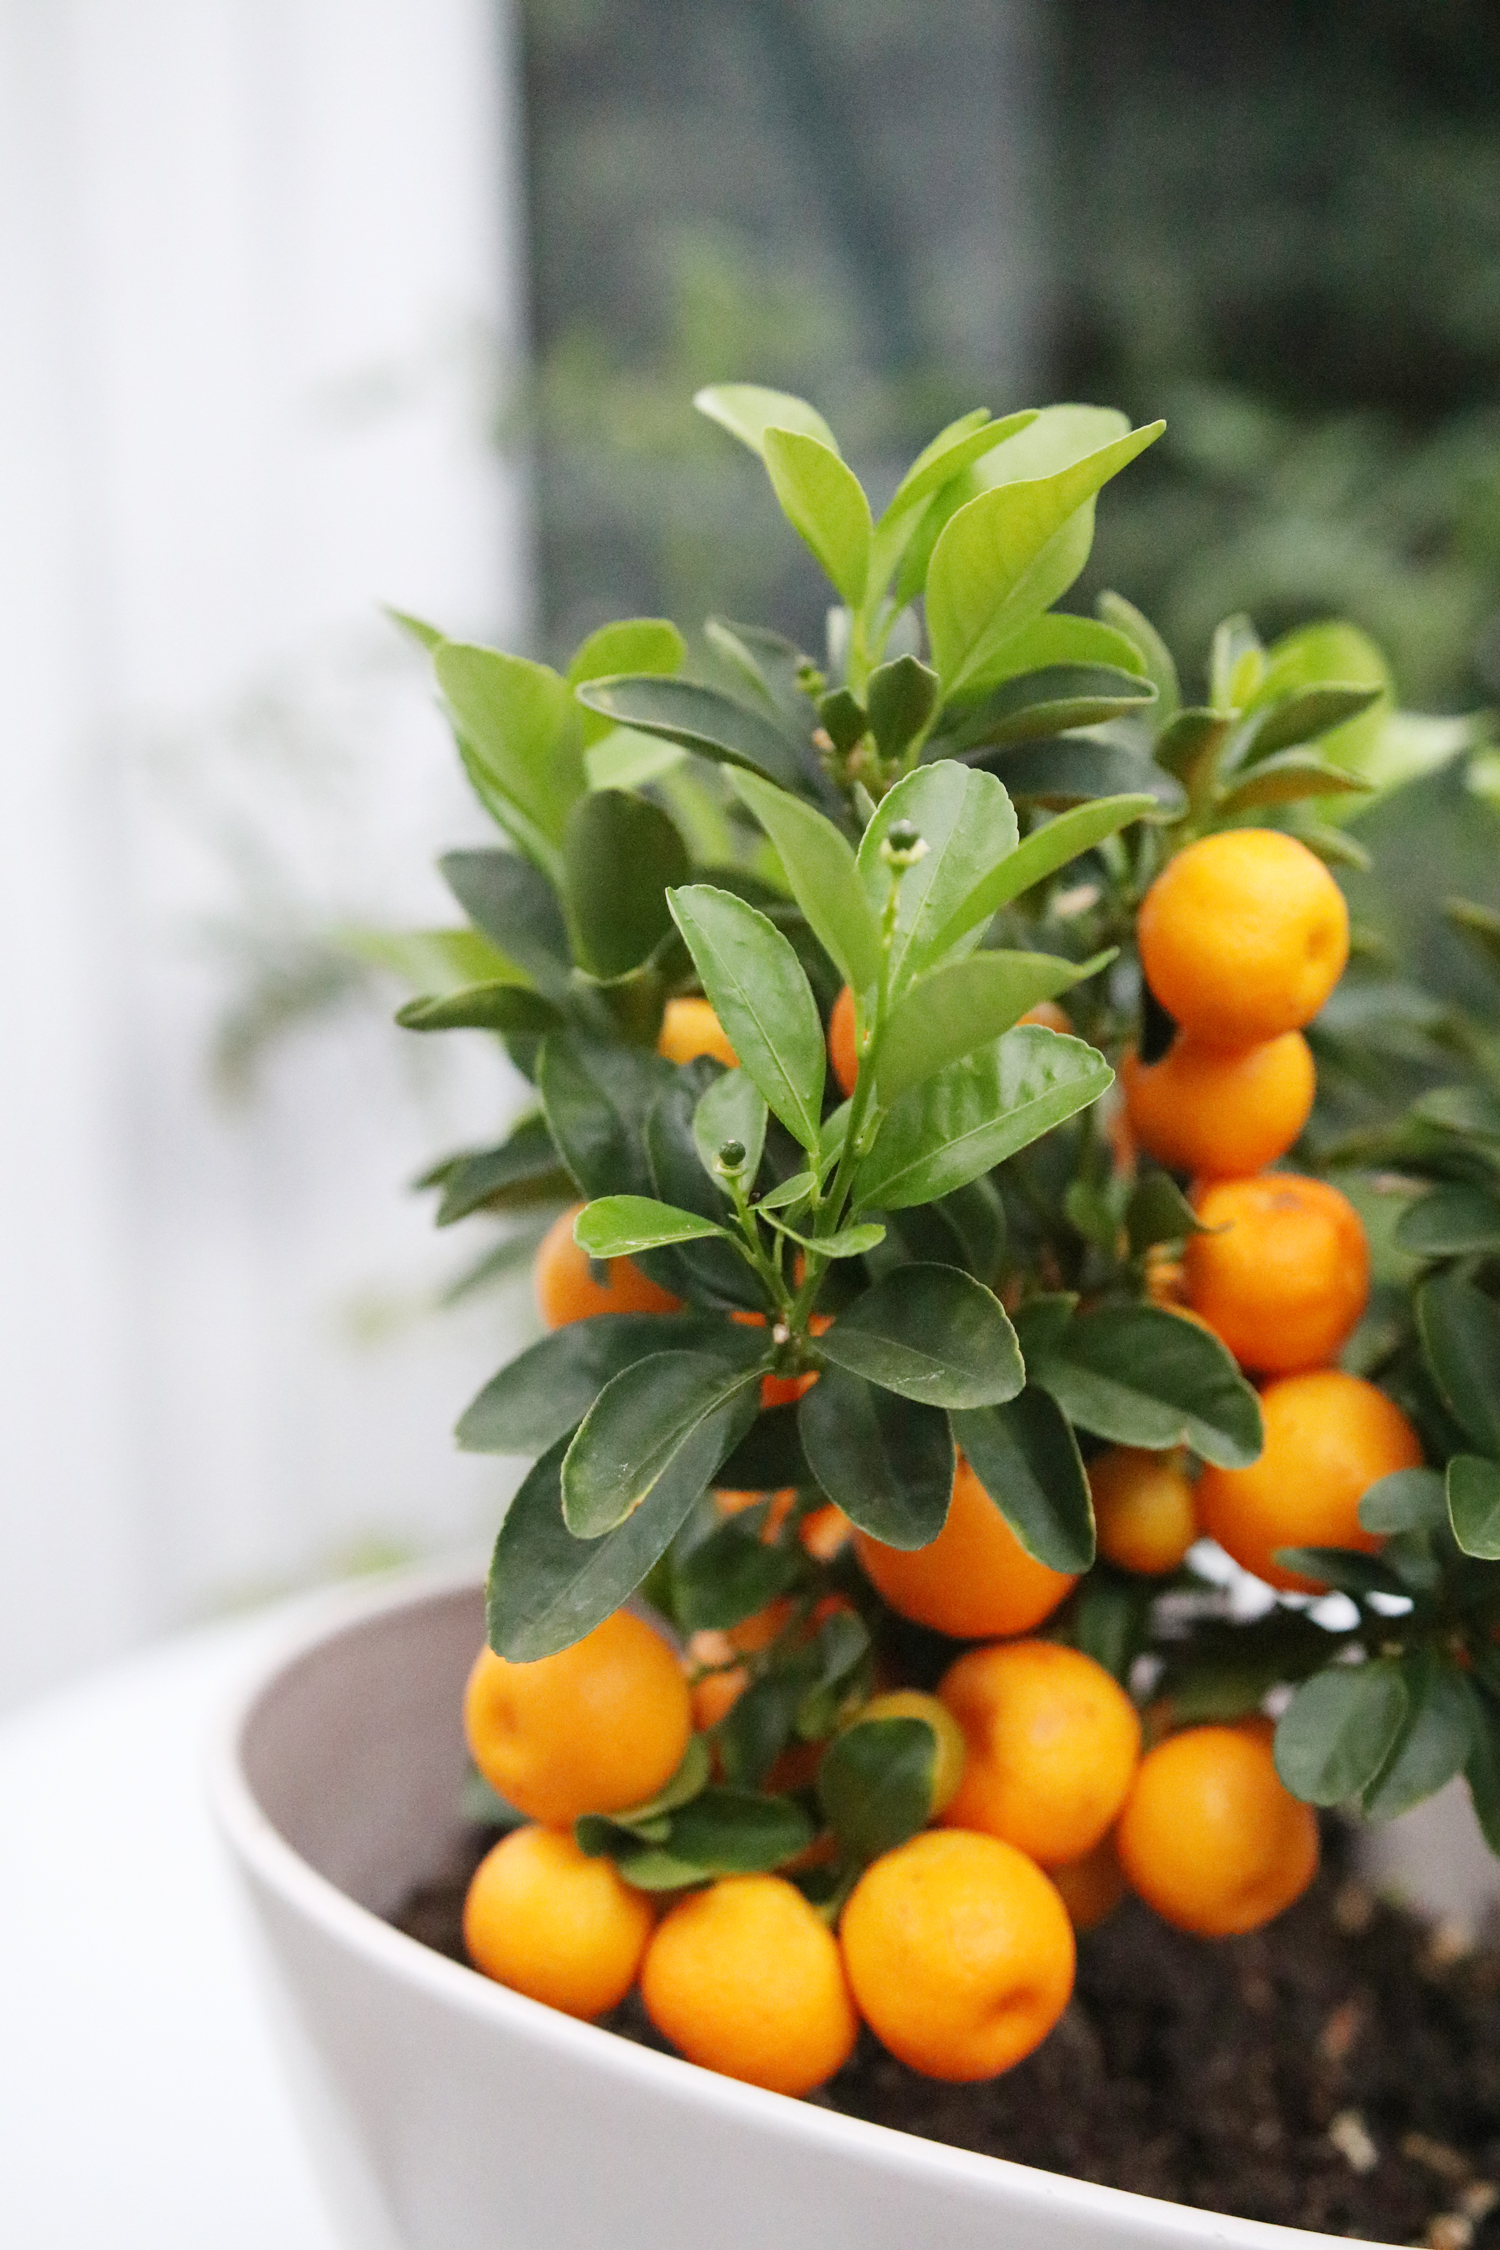 Bra Mitt växthus — SOFIAMILK TZ-81